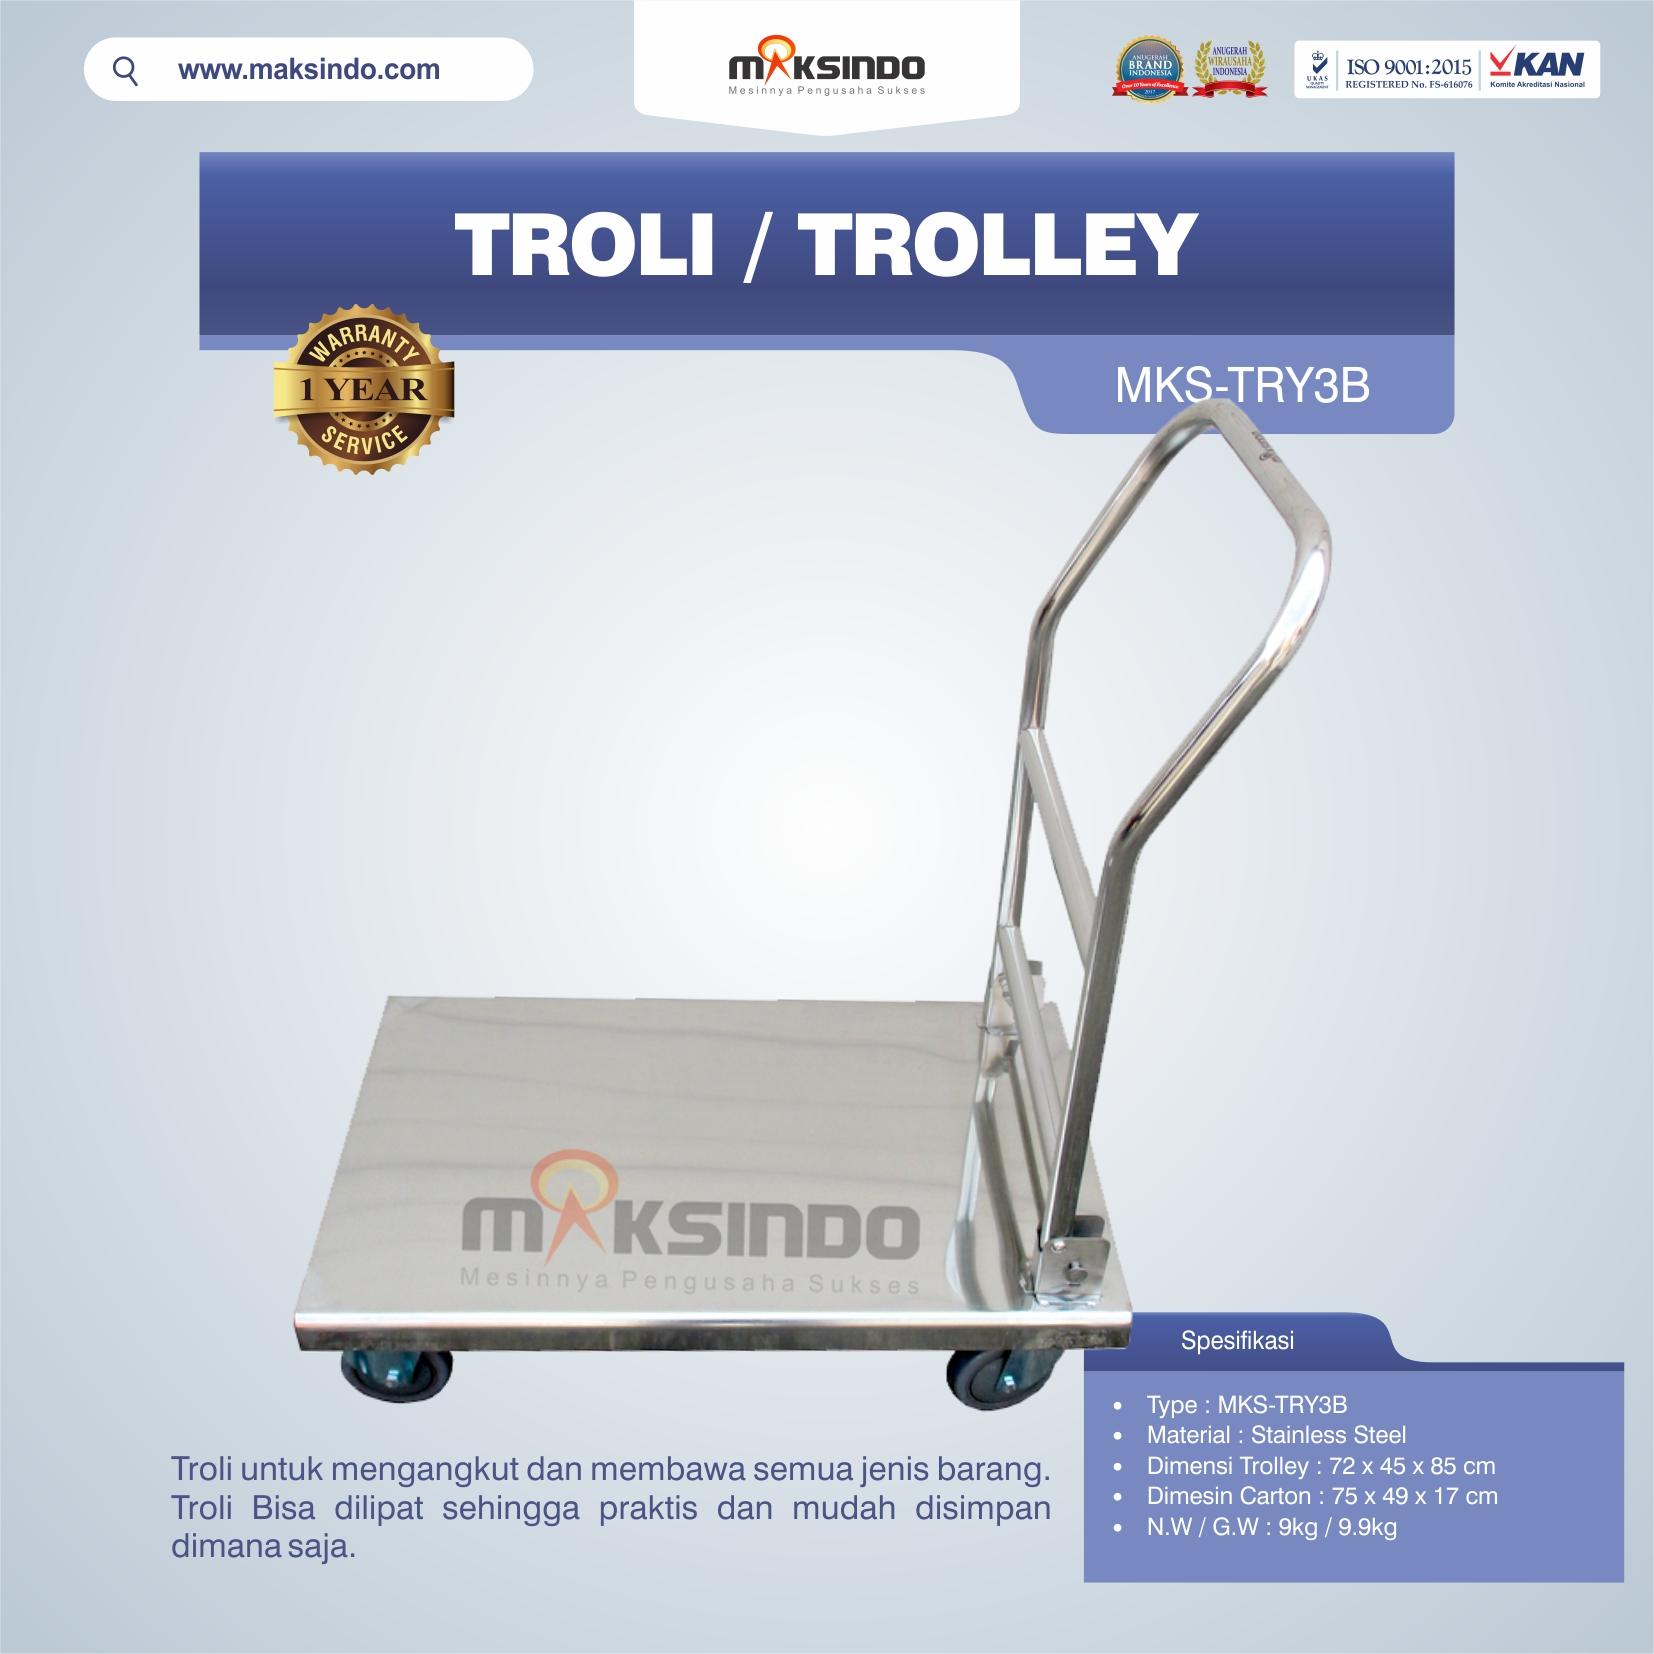 Jual Troli/Trolley MKS-TRY3B di Malang